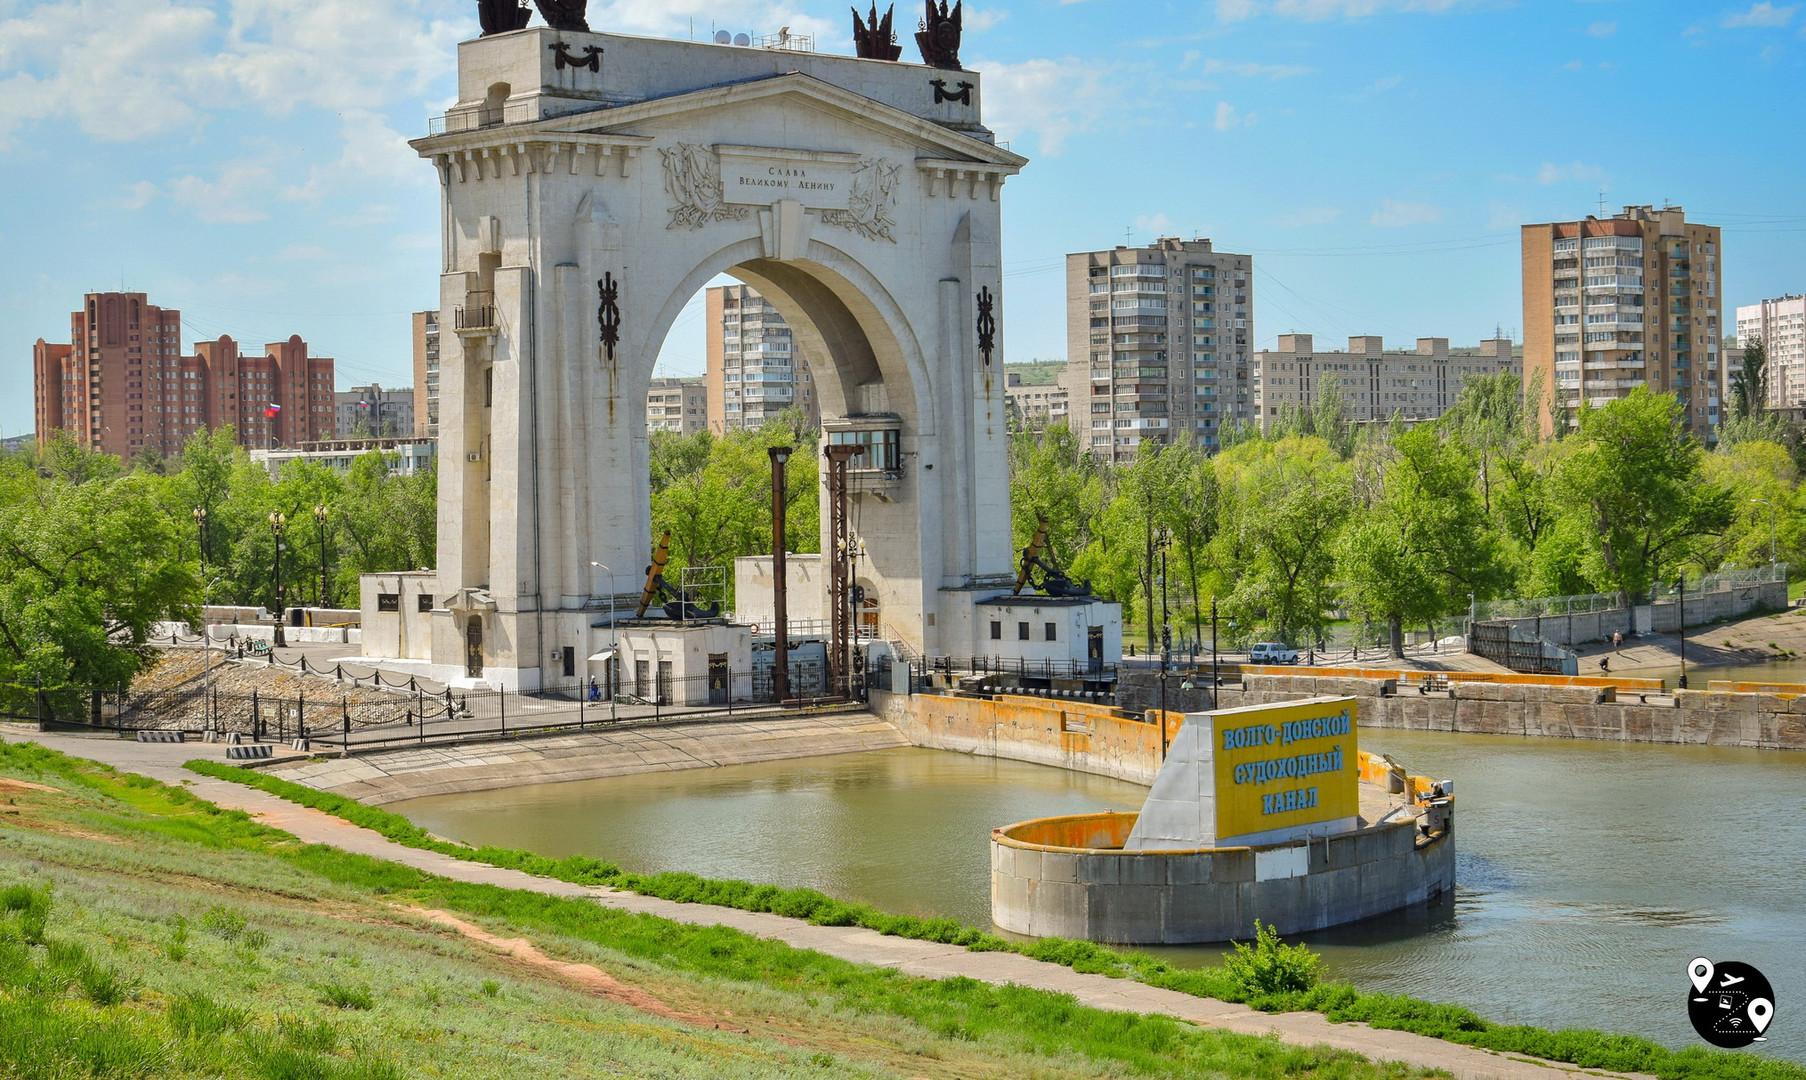 Арка Волго-Донского канала, Волгоград